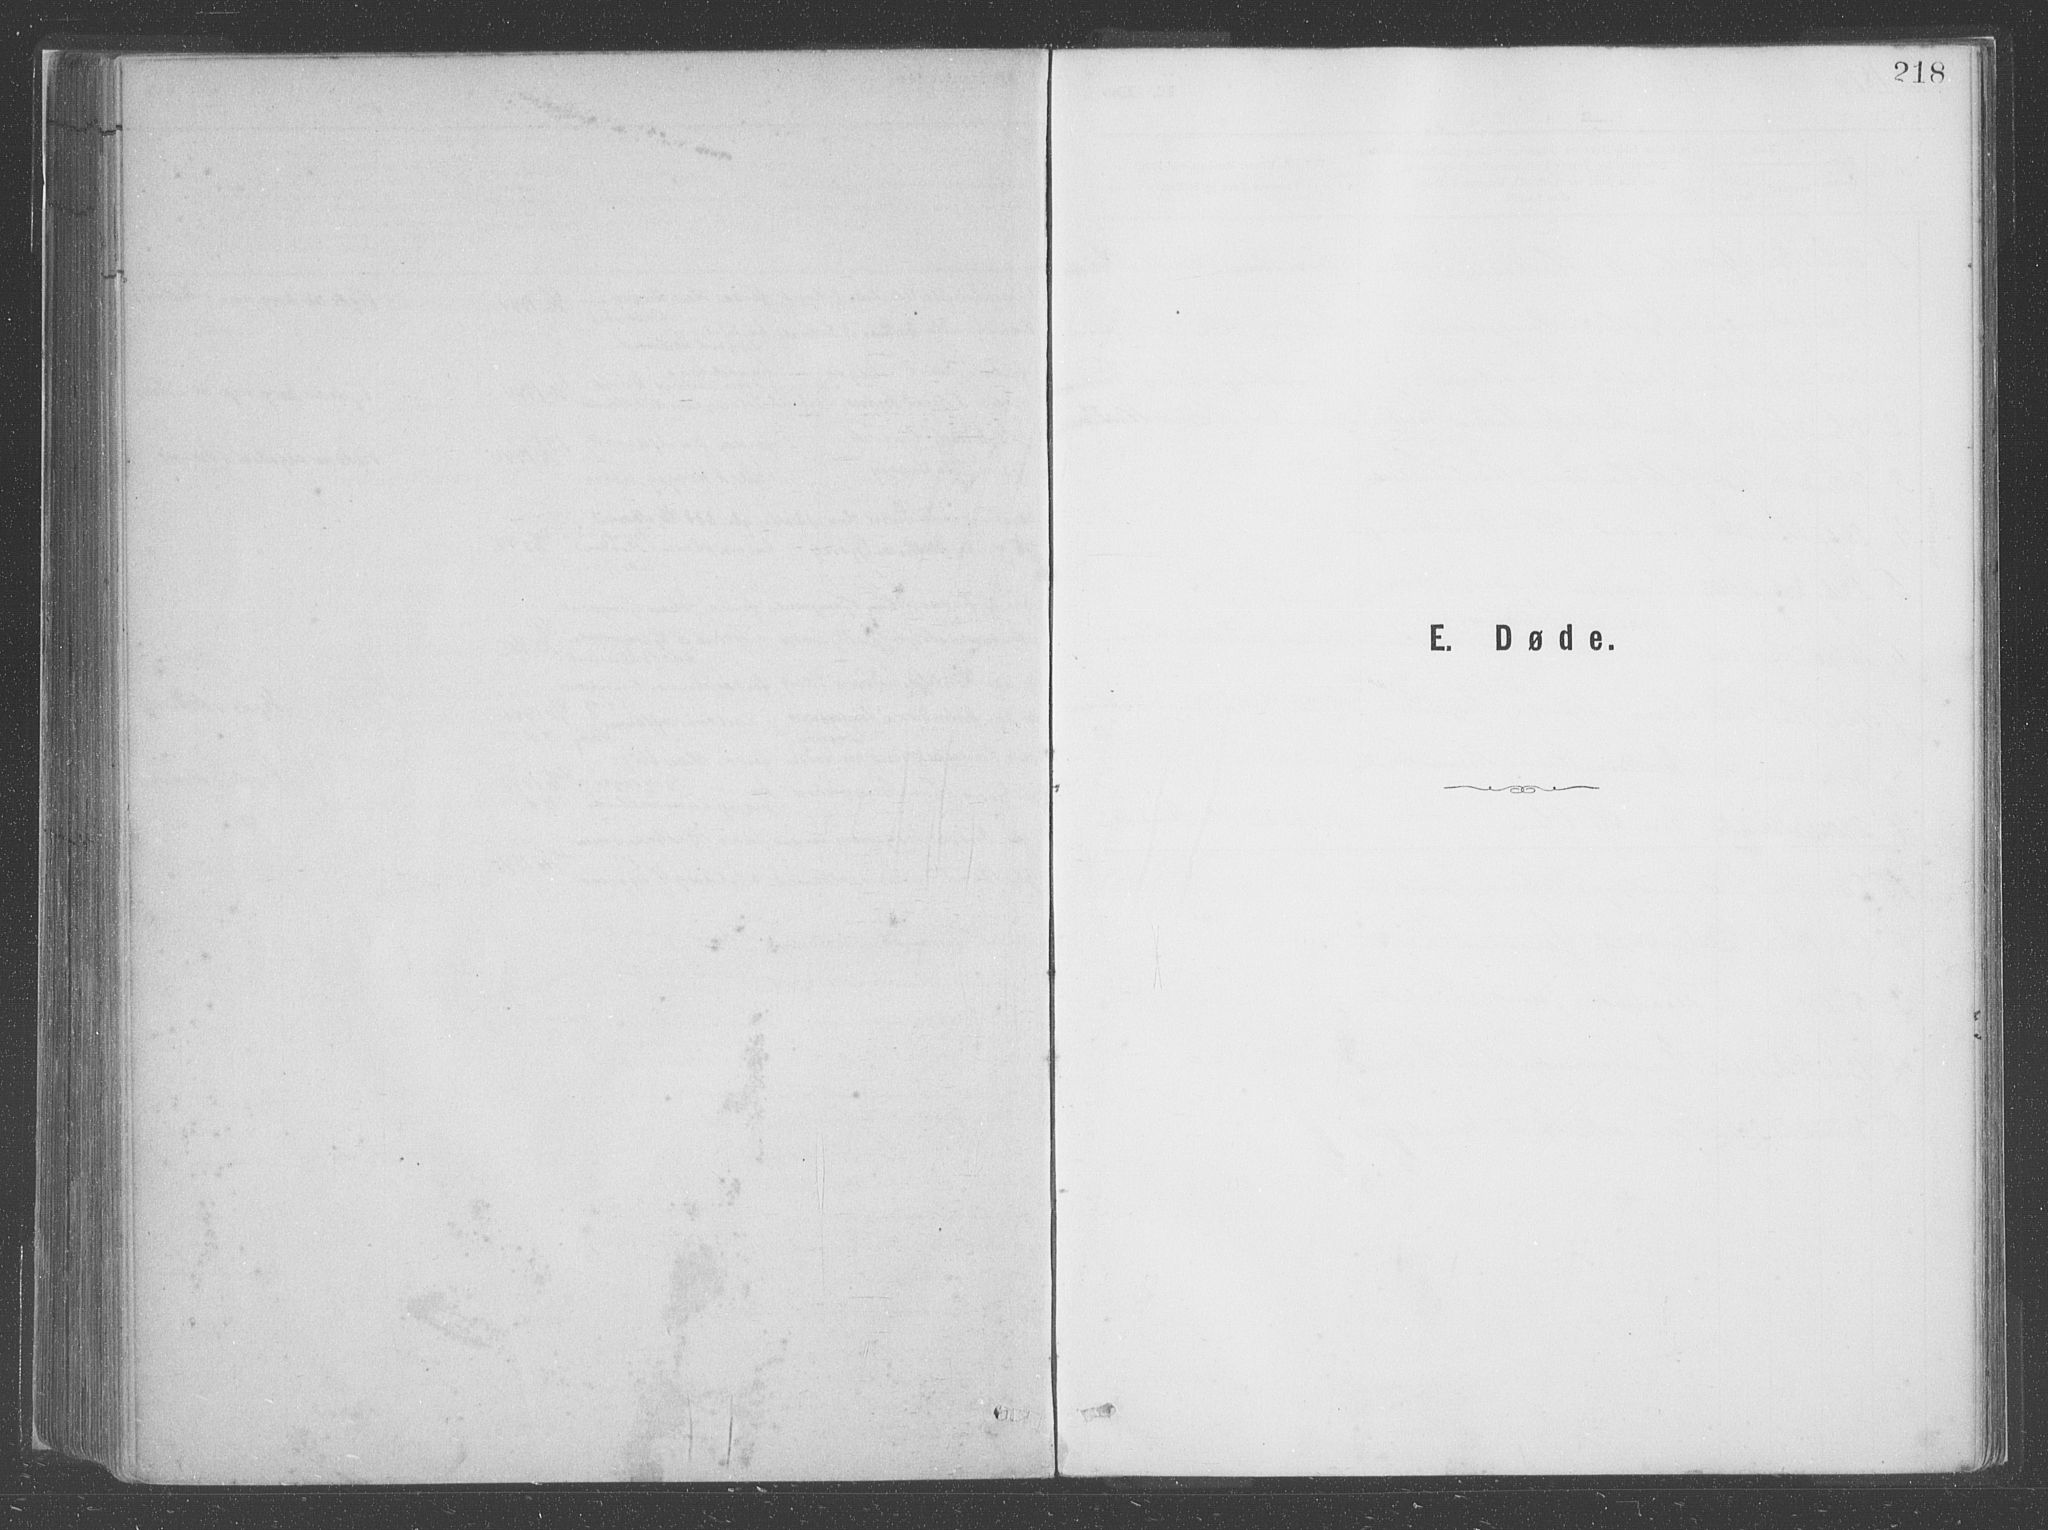 SAB, Askvoll Sokneprestembete, Ministerialbok nr. C  1, 1879-1922, s. 218